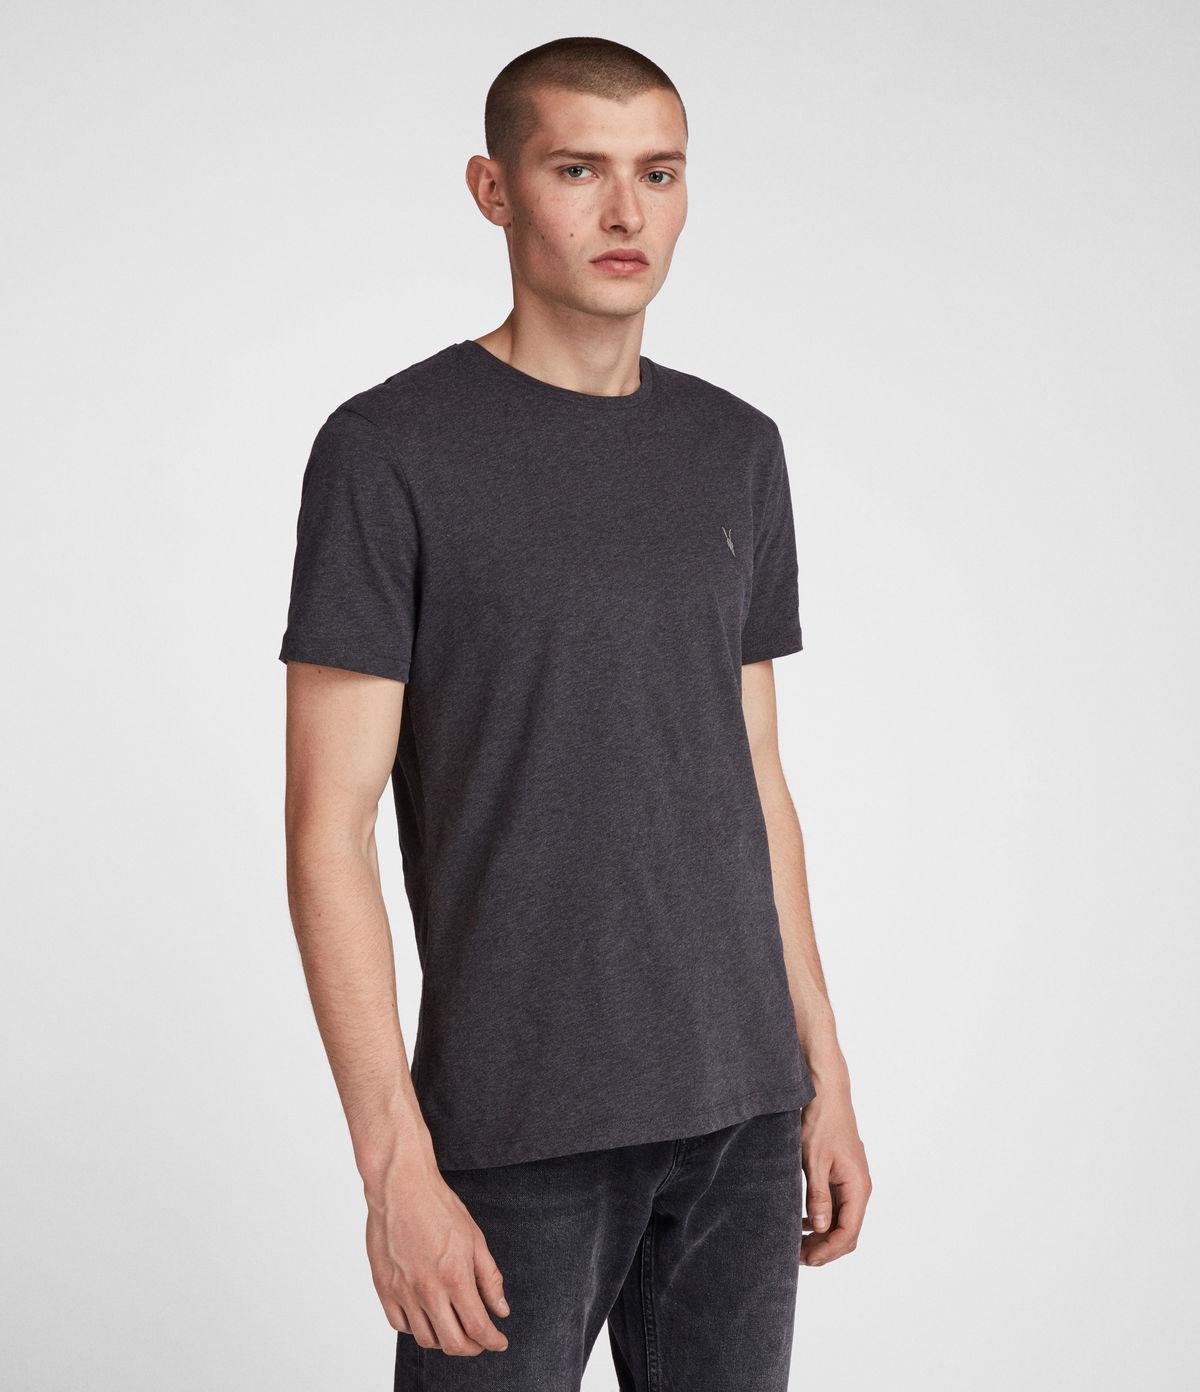 d5174c369 Lyst - Allsaints Brace Tonic Crew T-shirt in Gray for Men